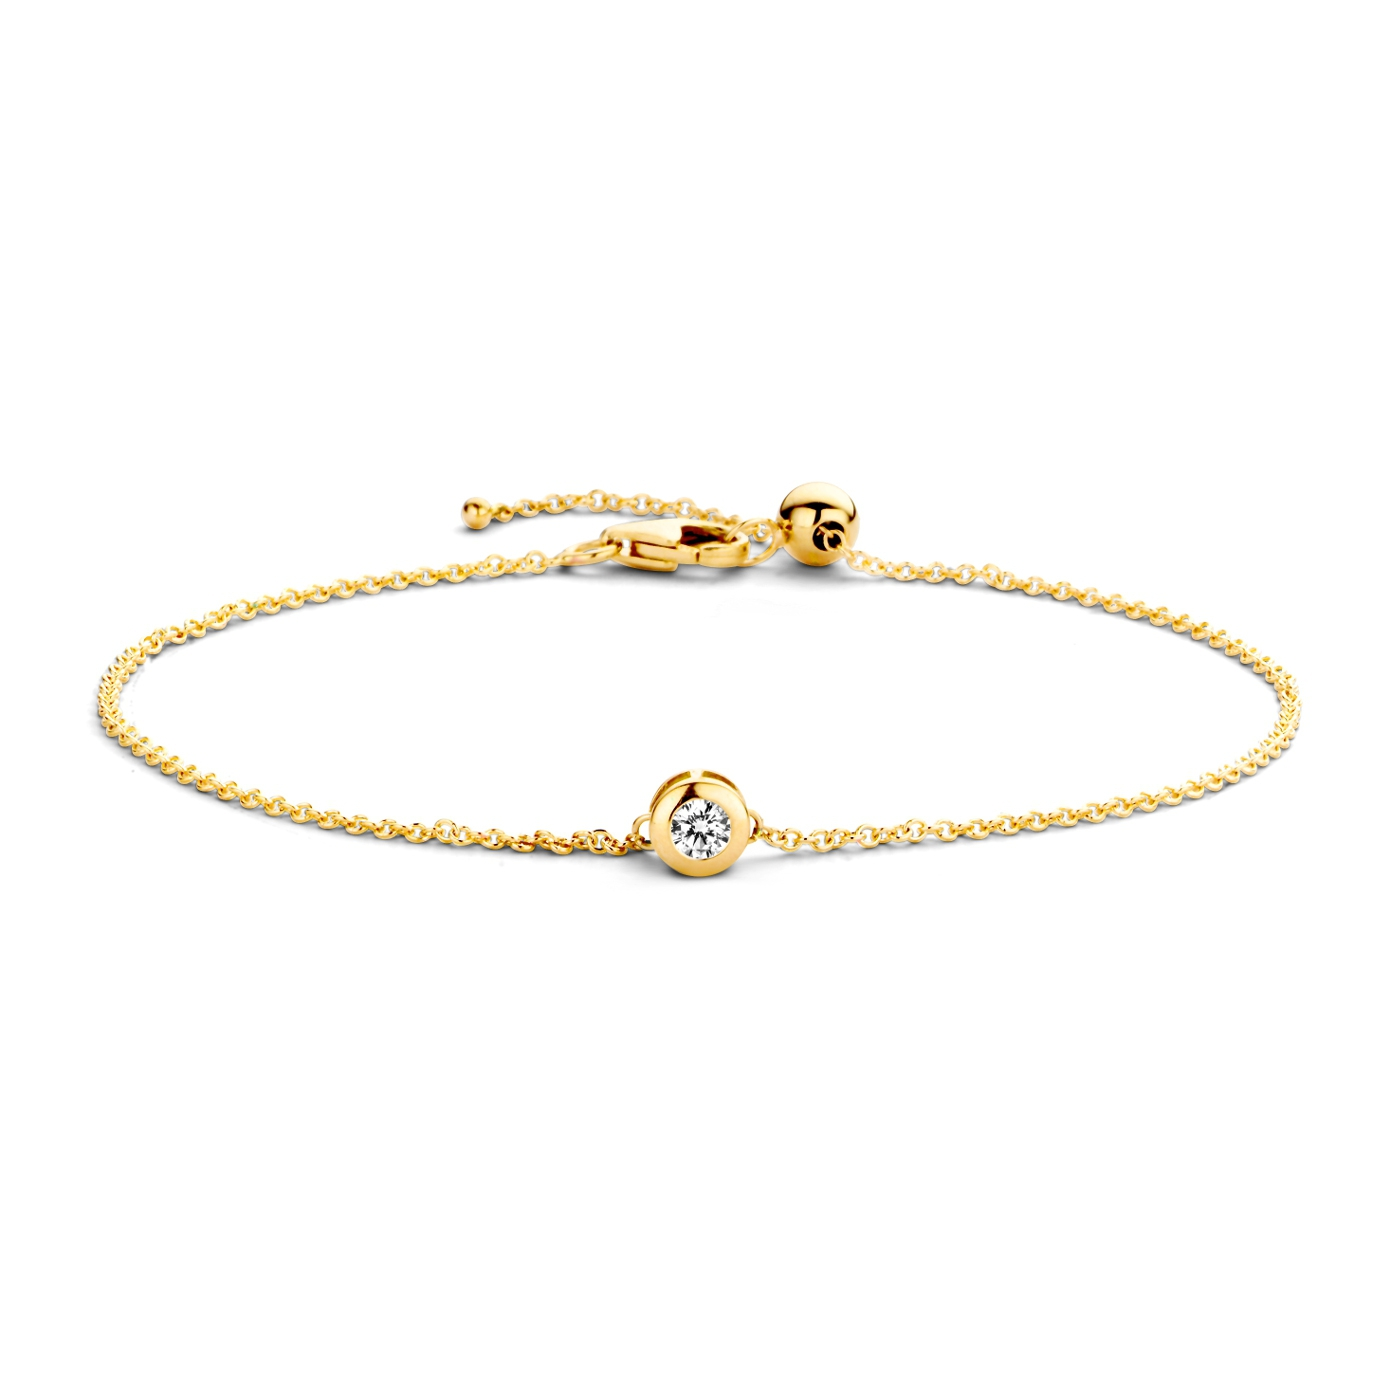 Afbeelding van Blush 14 Karaat Gouden Armband 2167YZI (Lengte: 18.00 cm)